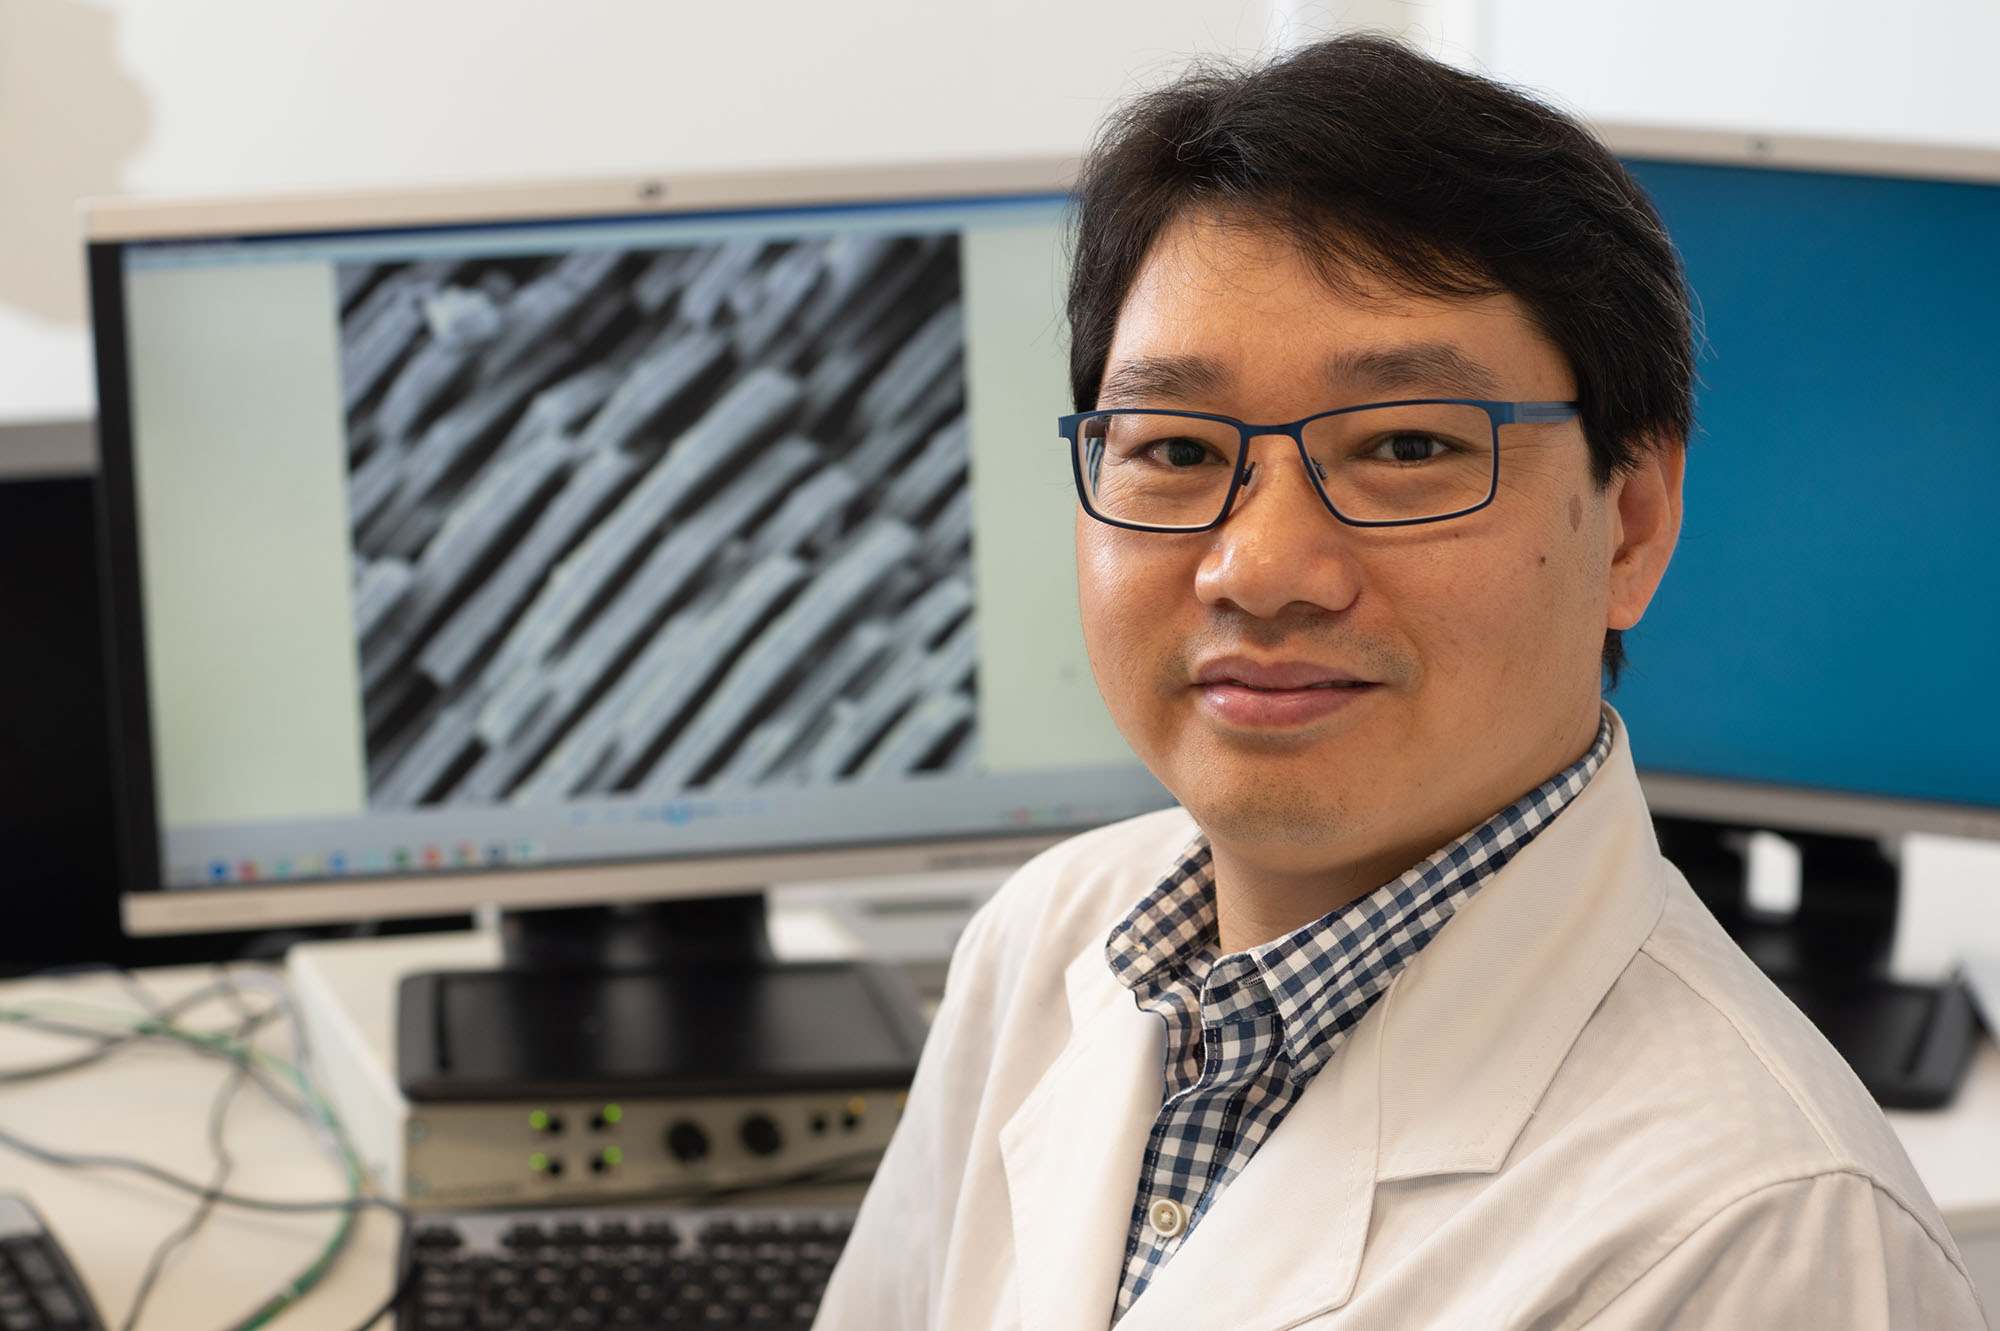 Associate Professor Ziqi Sun